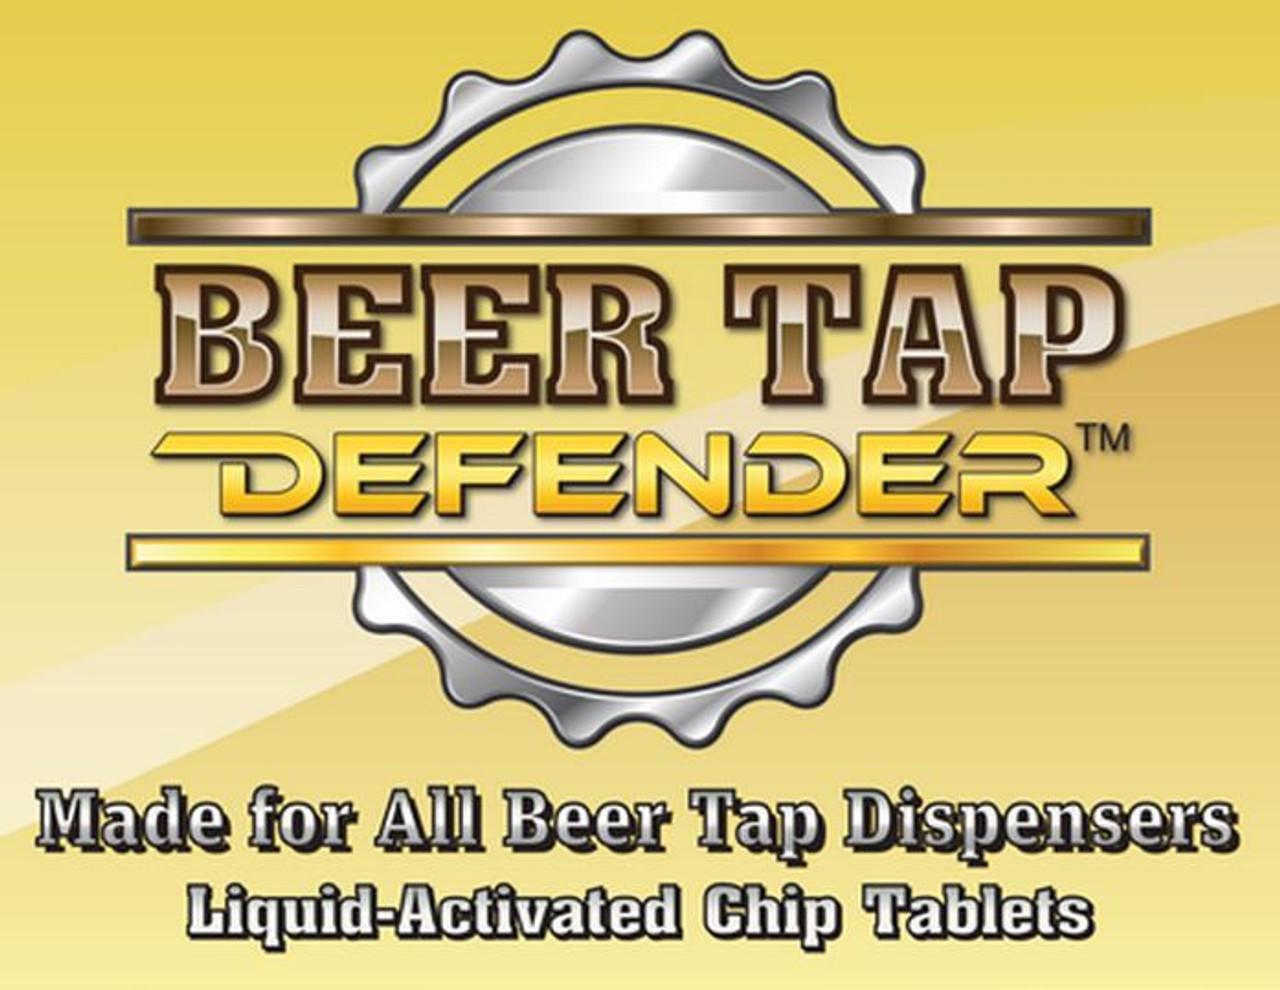 Beer Tap Defender (16-pk) drip tray deodorizer